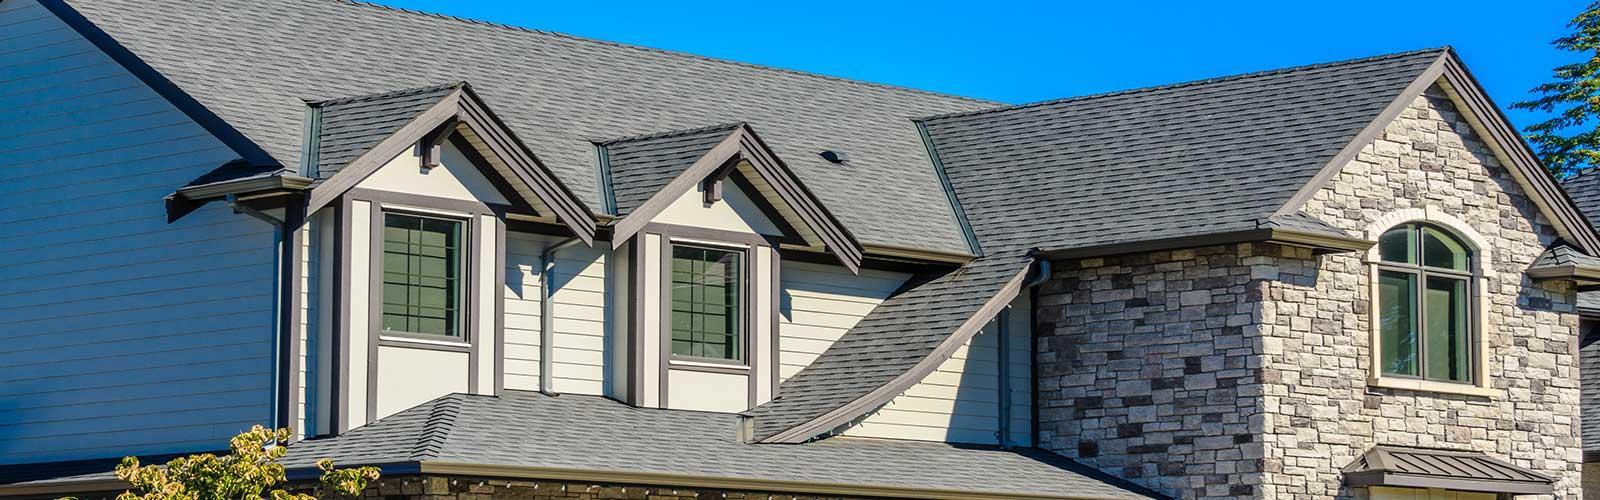 Home | Topside Roofing U0026 Siding